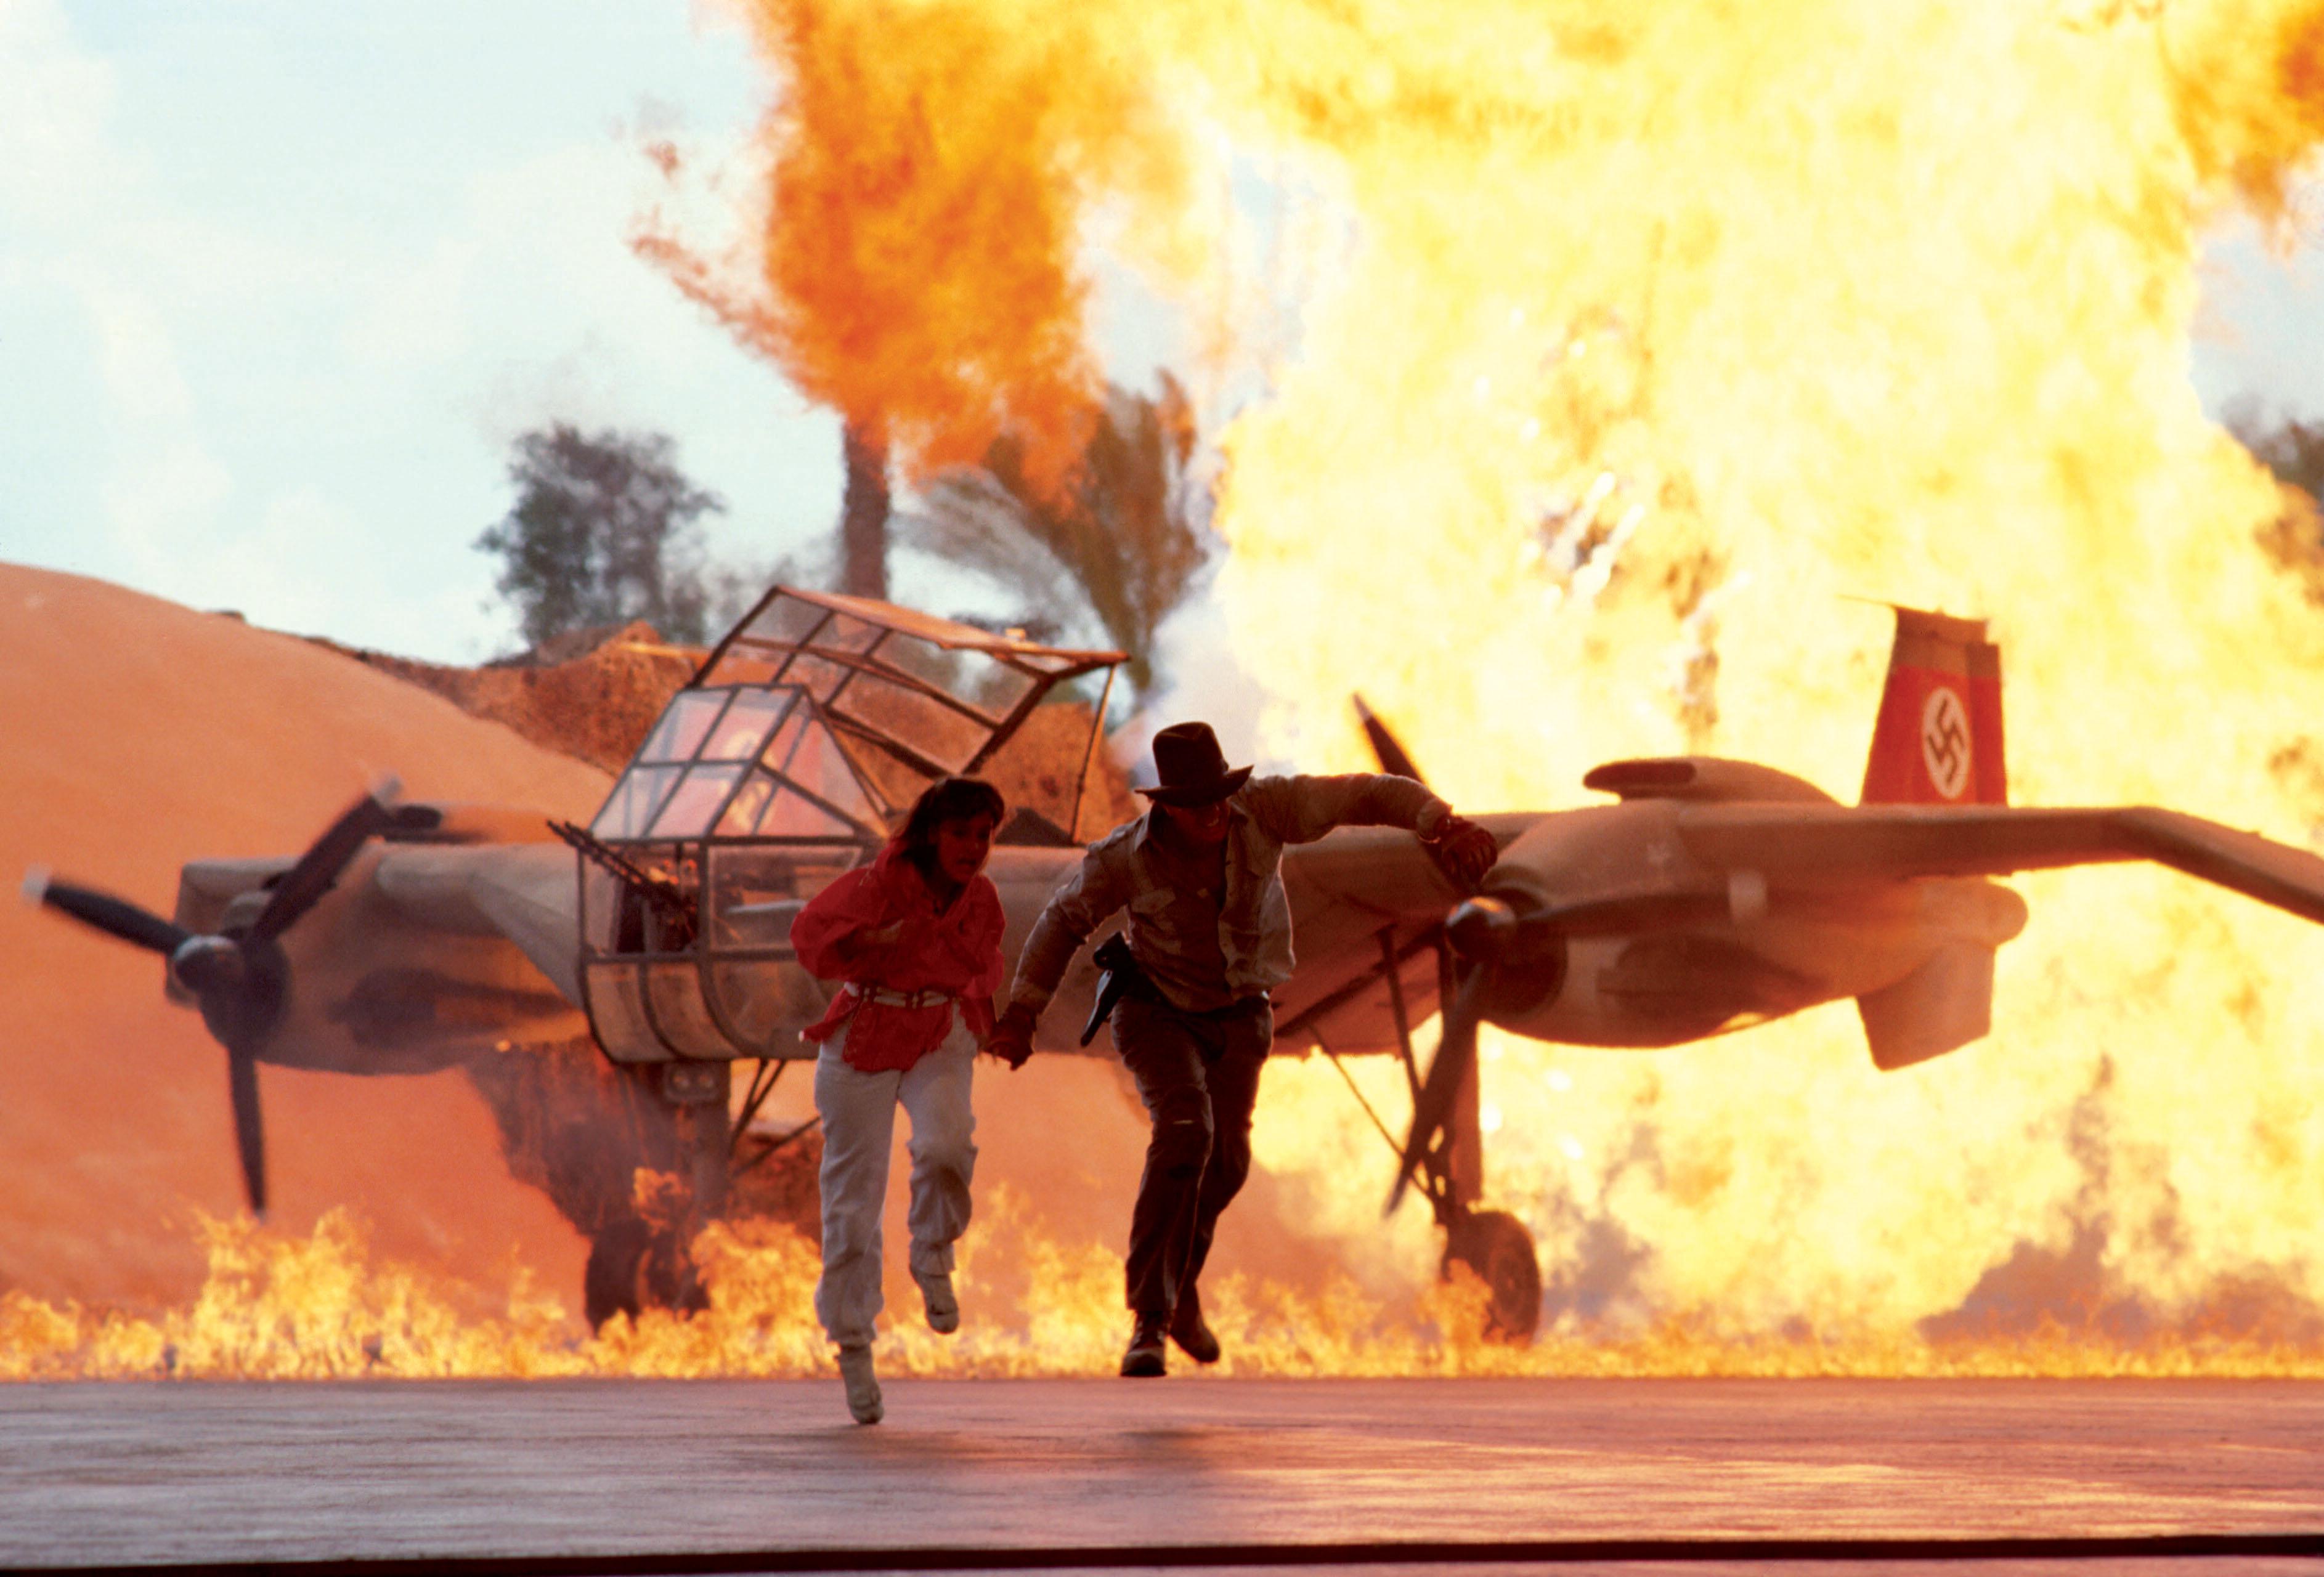 Indiana Jones stunt show at Walt Disney World